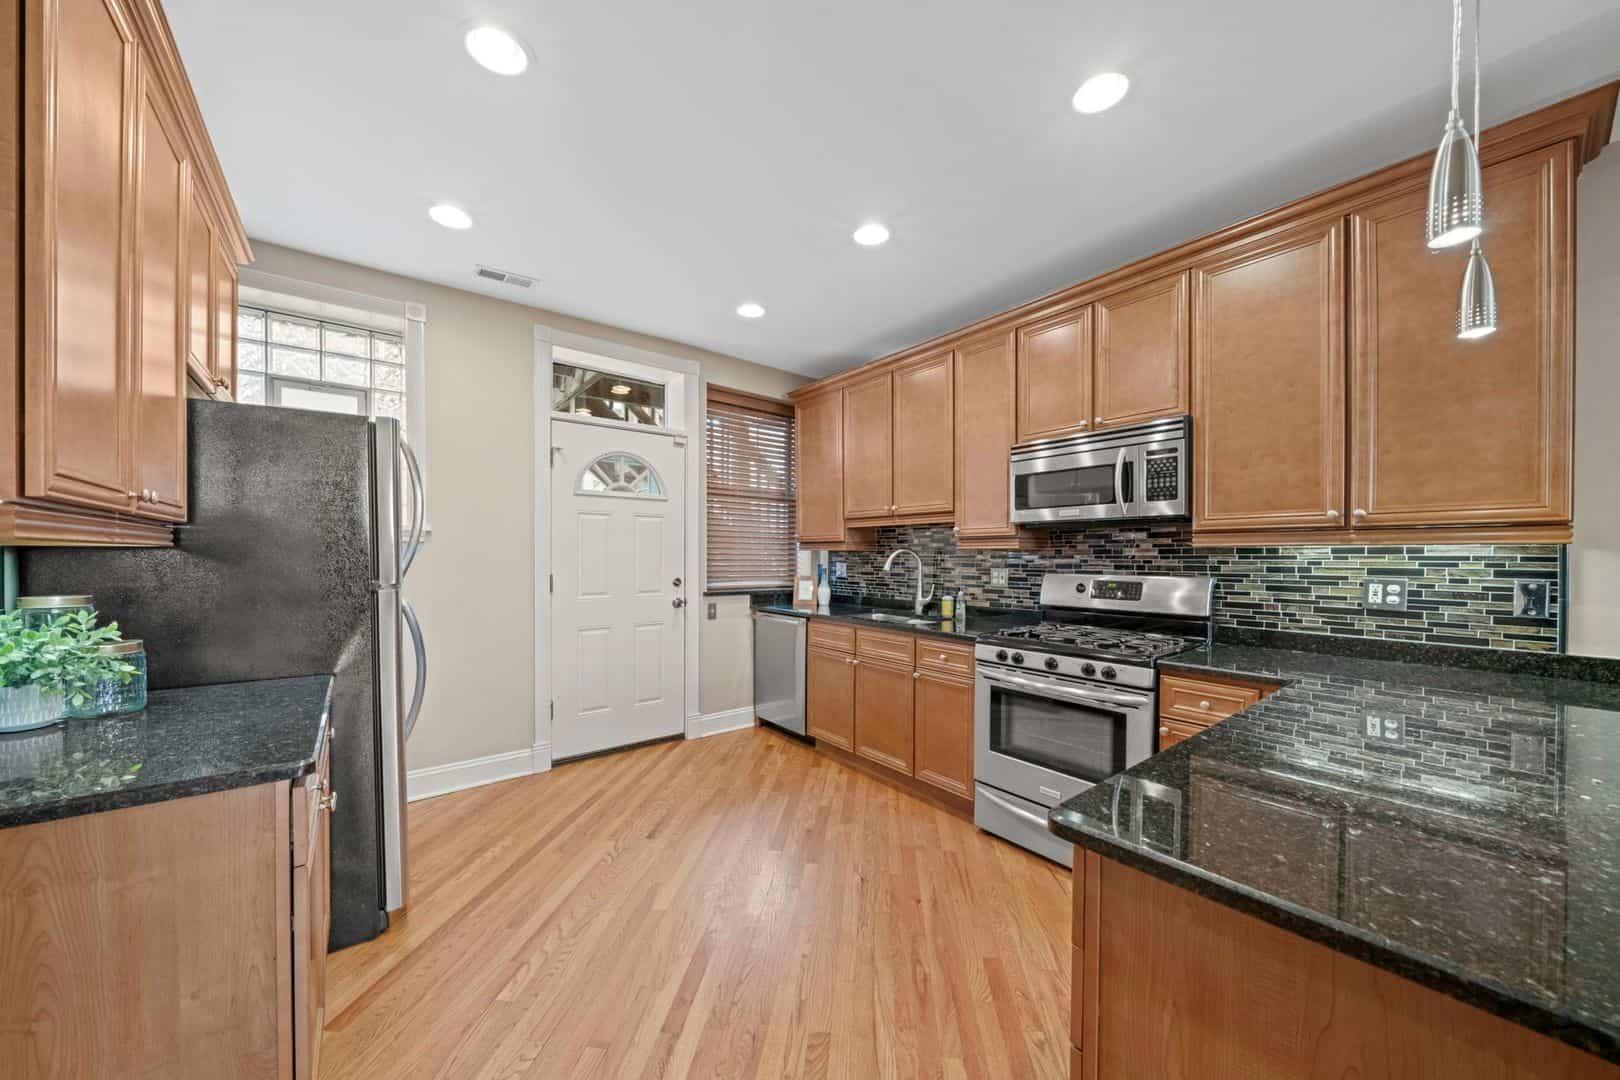 5319 South Harper - Spacious Kitchen